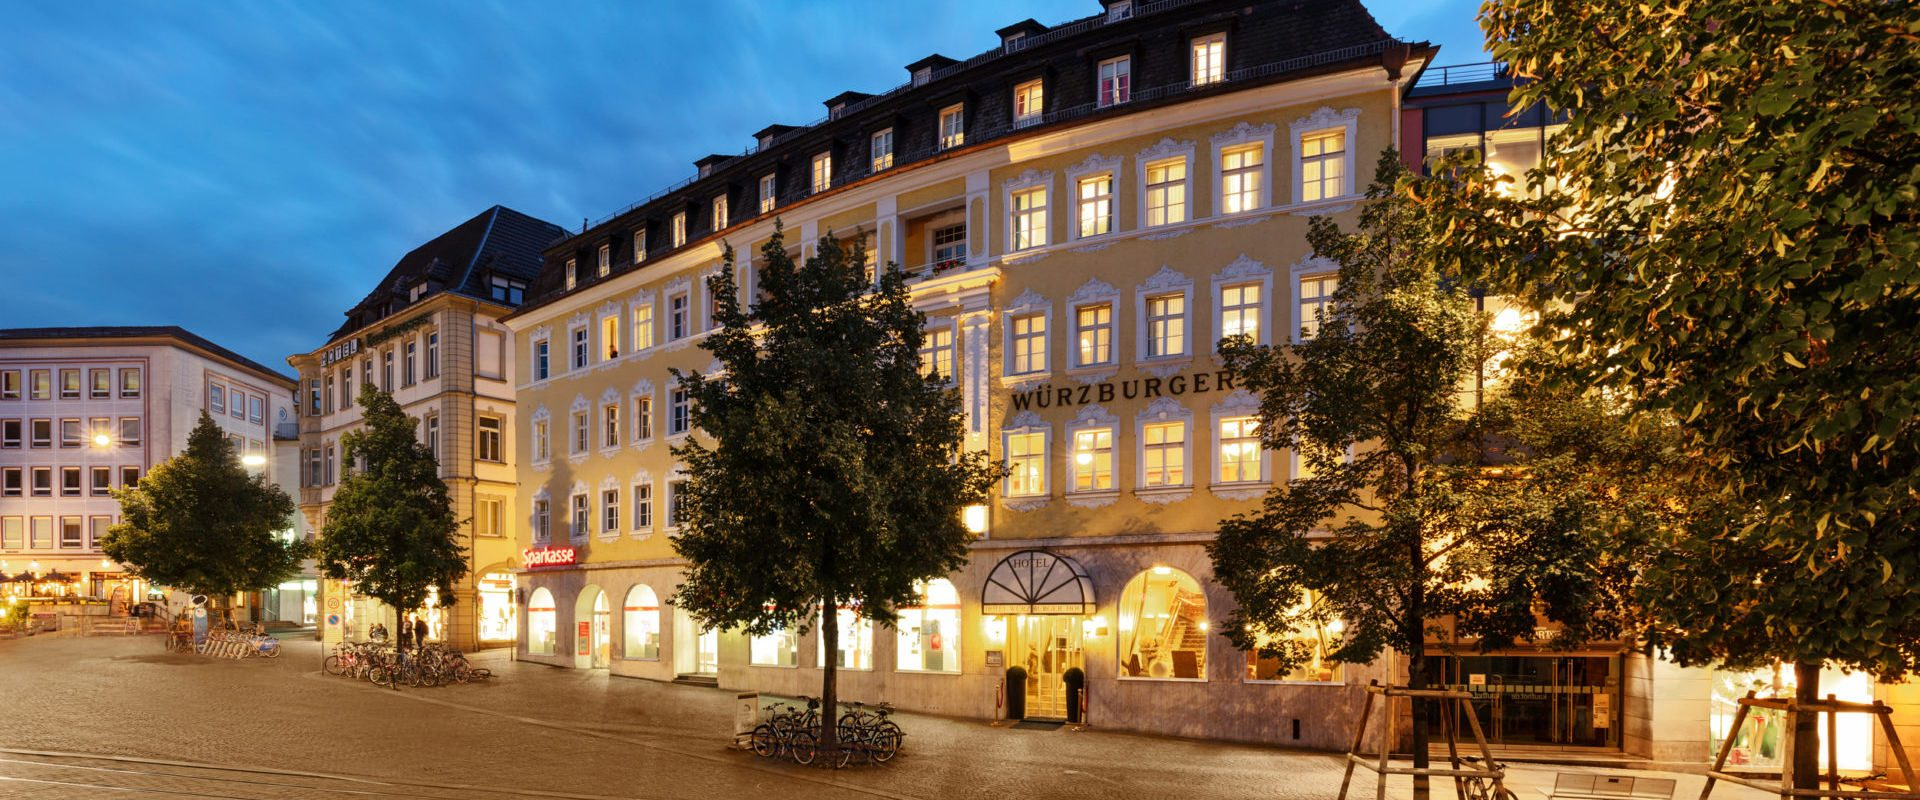 Würzburger-Hof-101